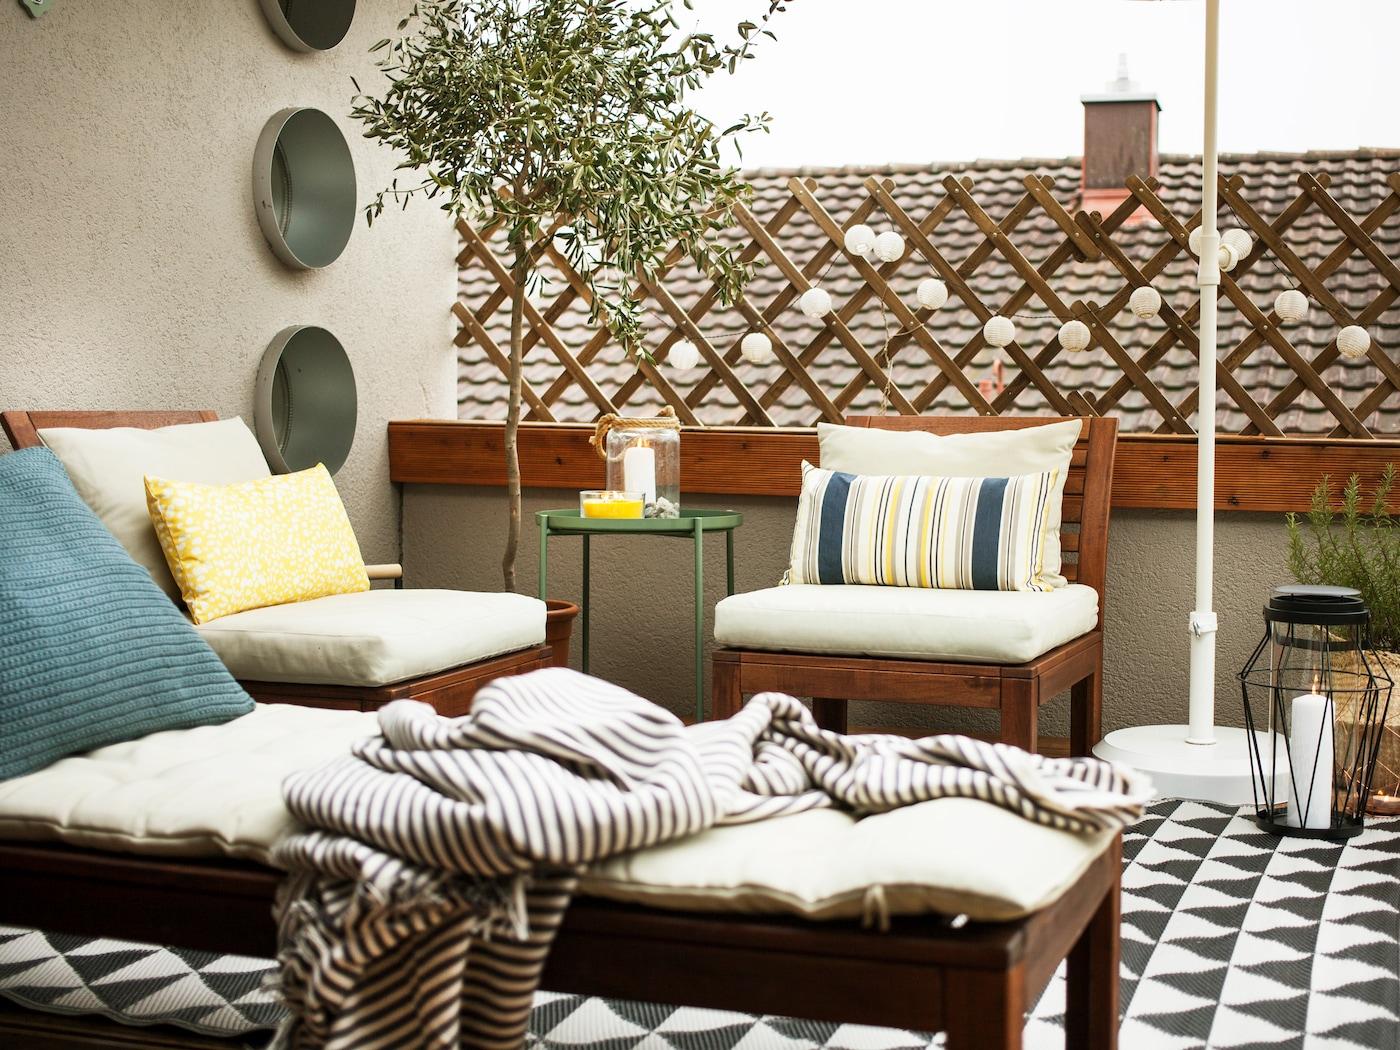 Comodi mobili da giardino con i tessili IKEA